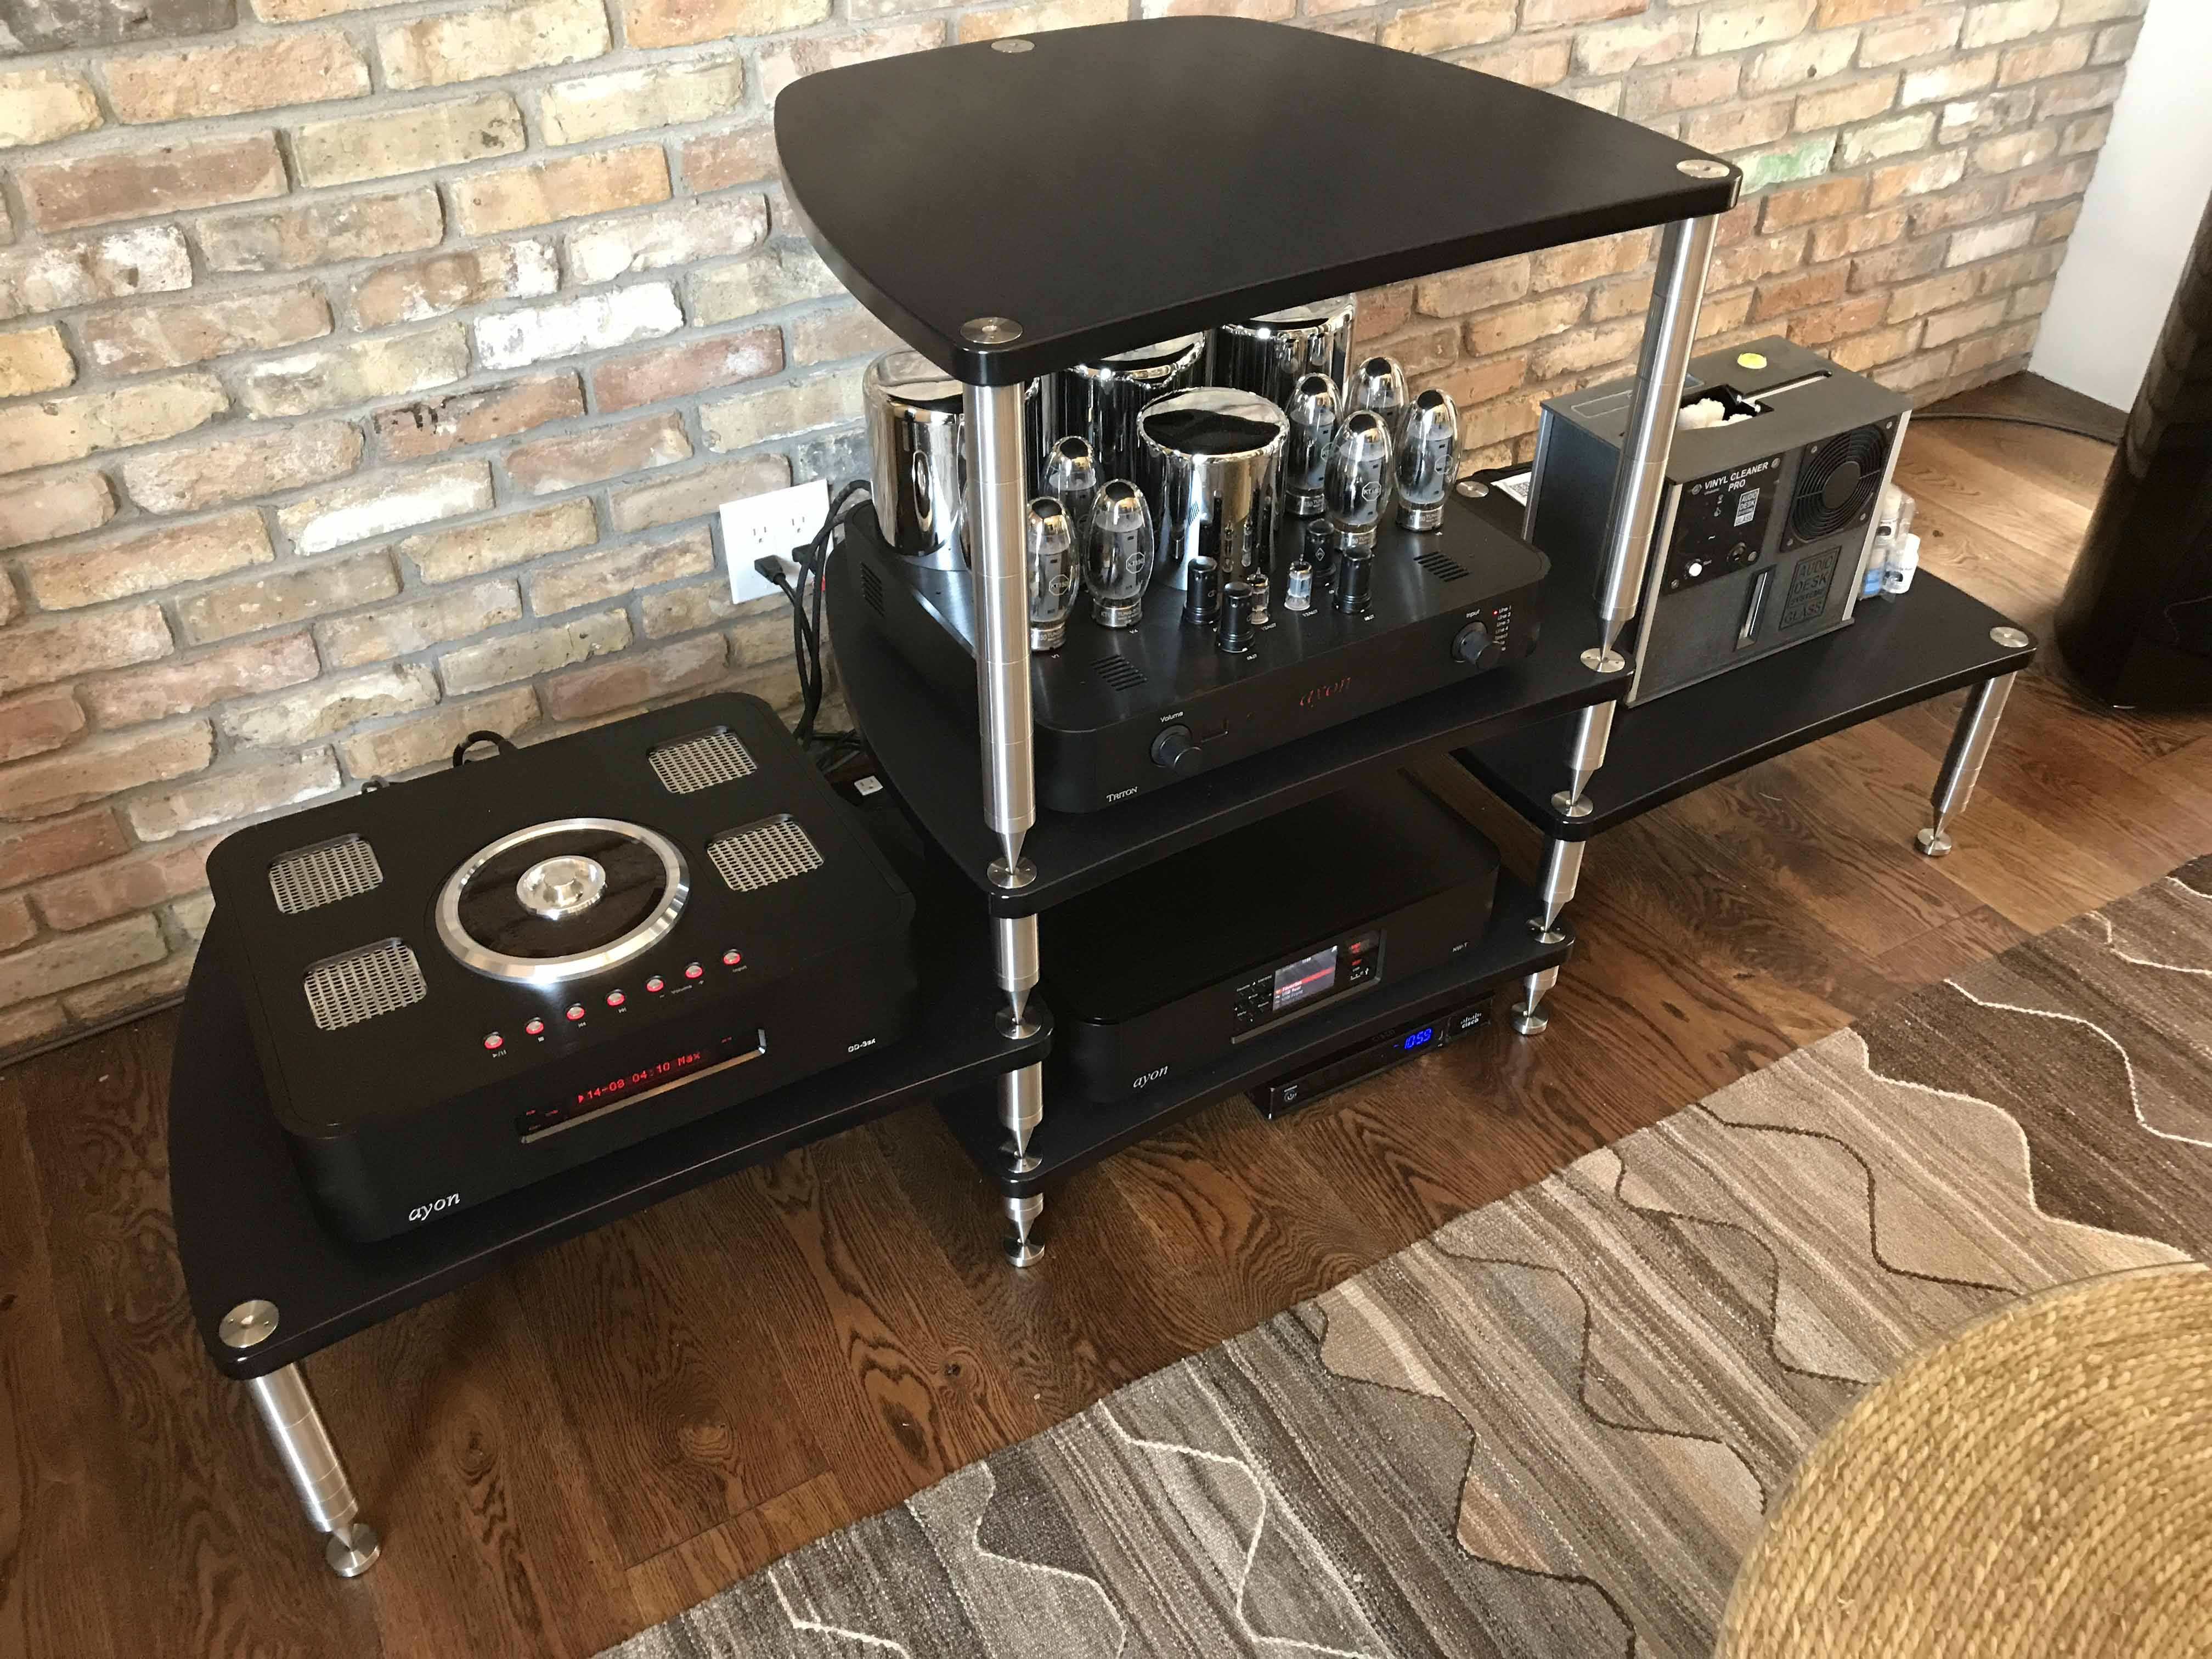 arizona hardwood floor supply scottsdale az of bbs audio amp stand high end audio racks usa tube audio throughout bbs audio rack black 2